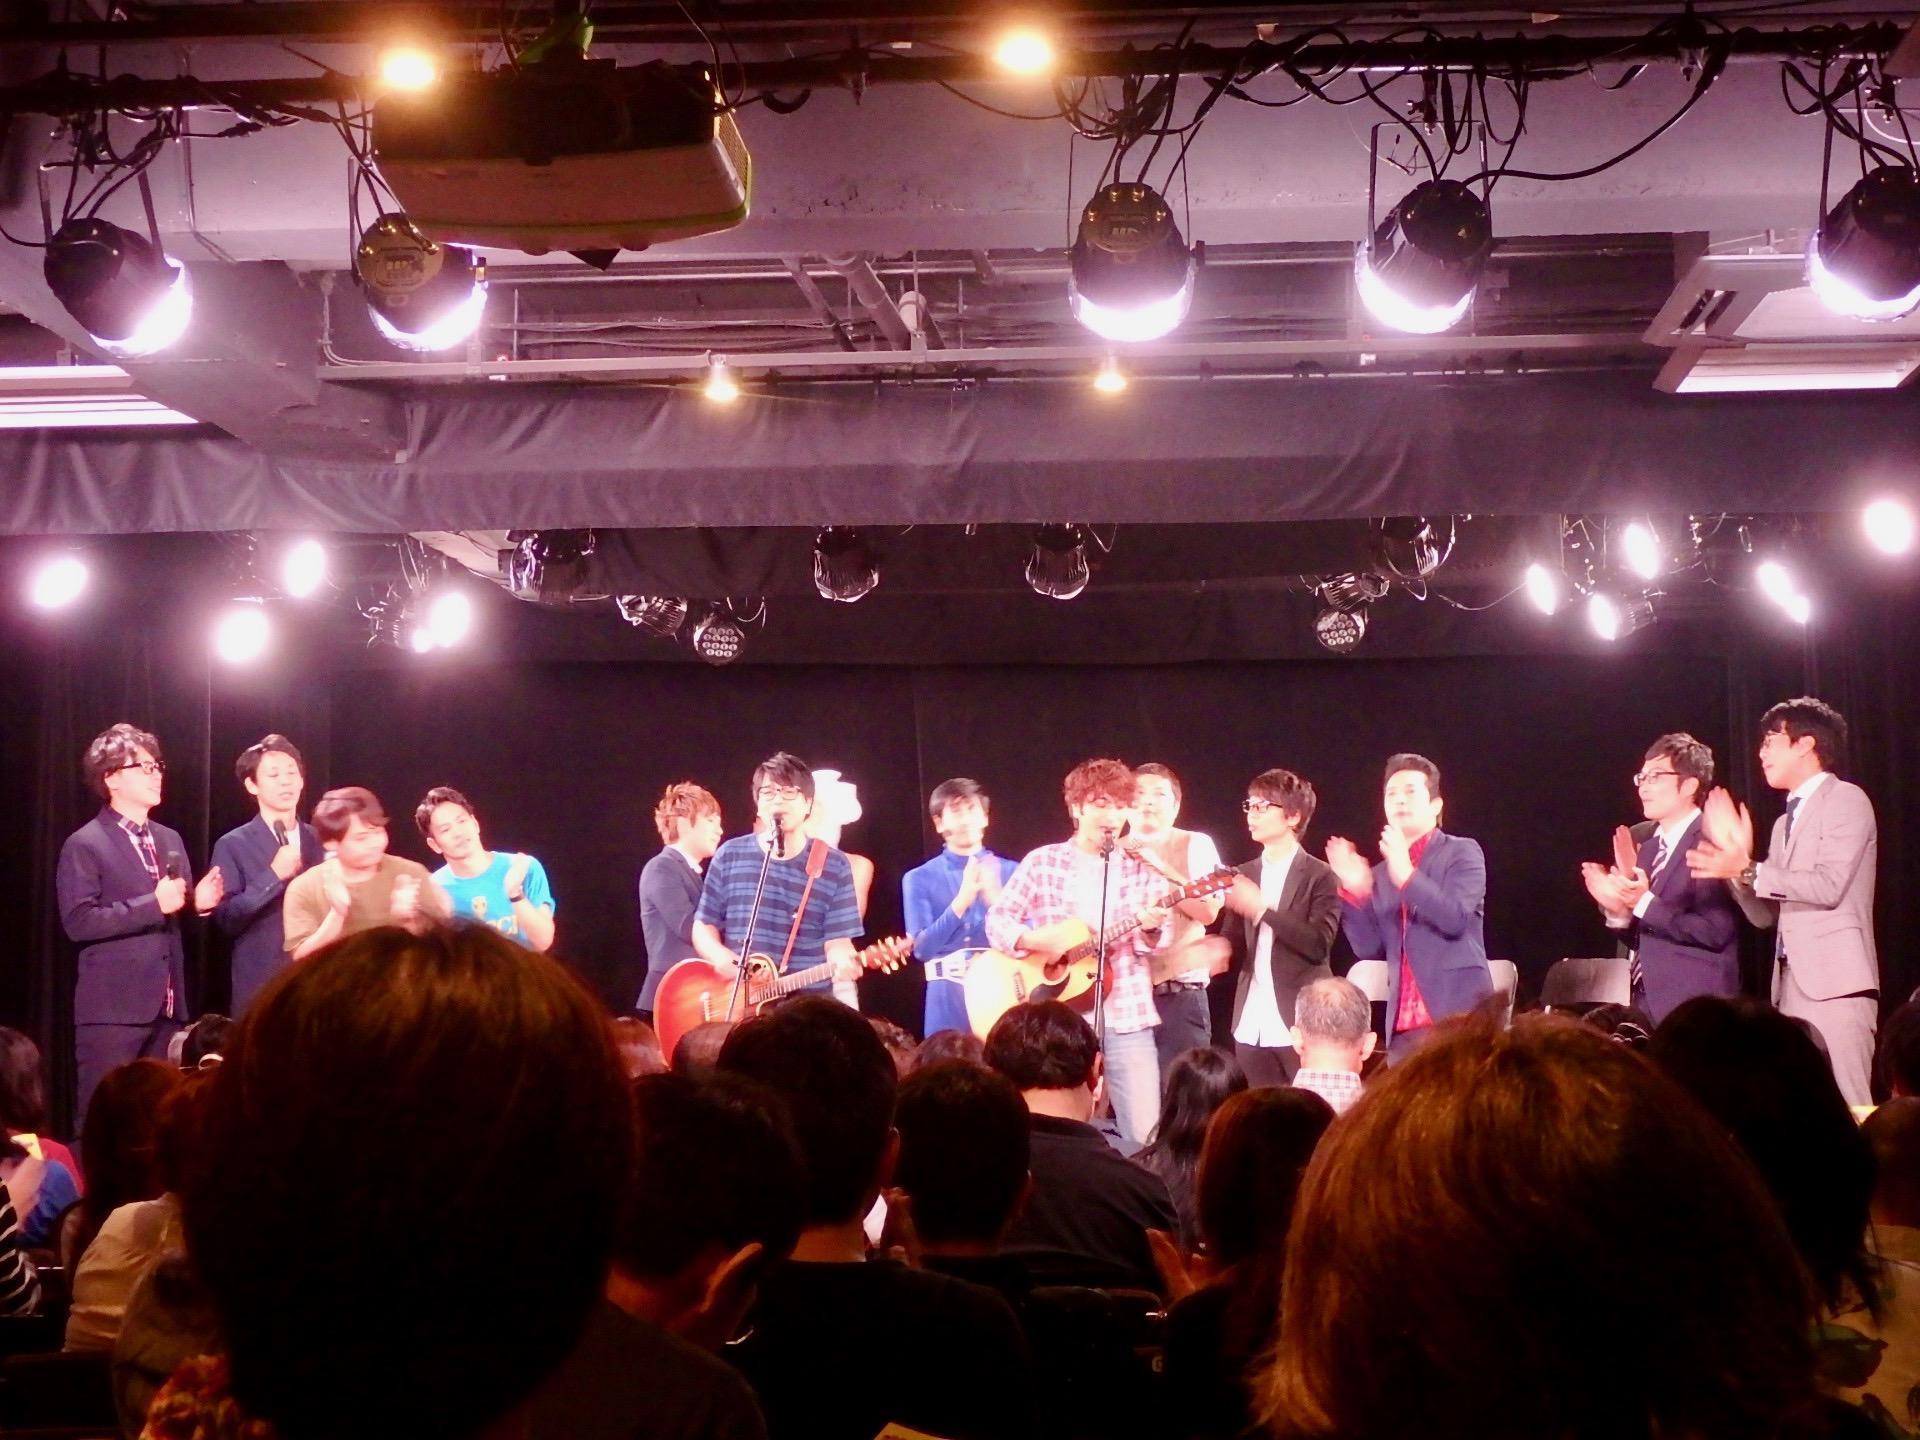 http://news.yoshimoto.co.jp/20171016143412-d115a1d569bfe7543ae284fbcbb8e5c97d1dfa41.jpg